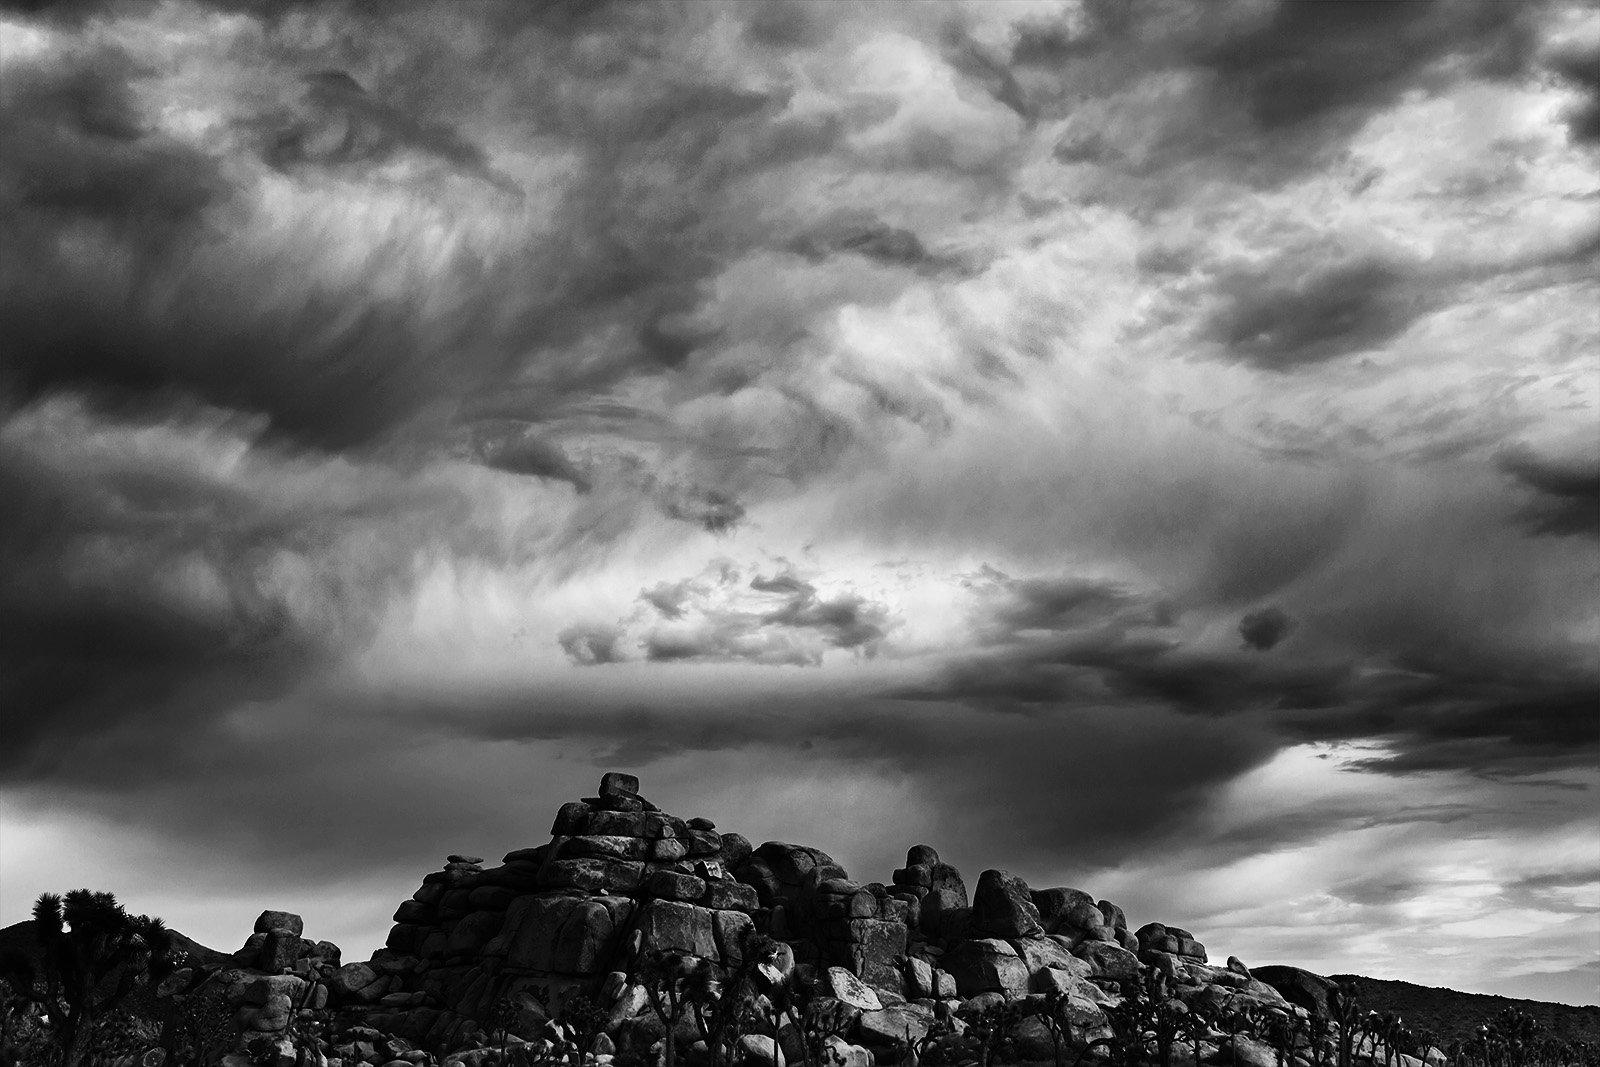 Incredible sky photo by Ceri Herd